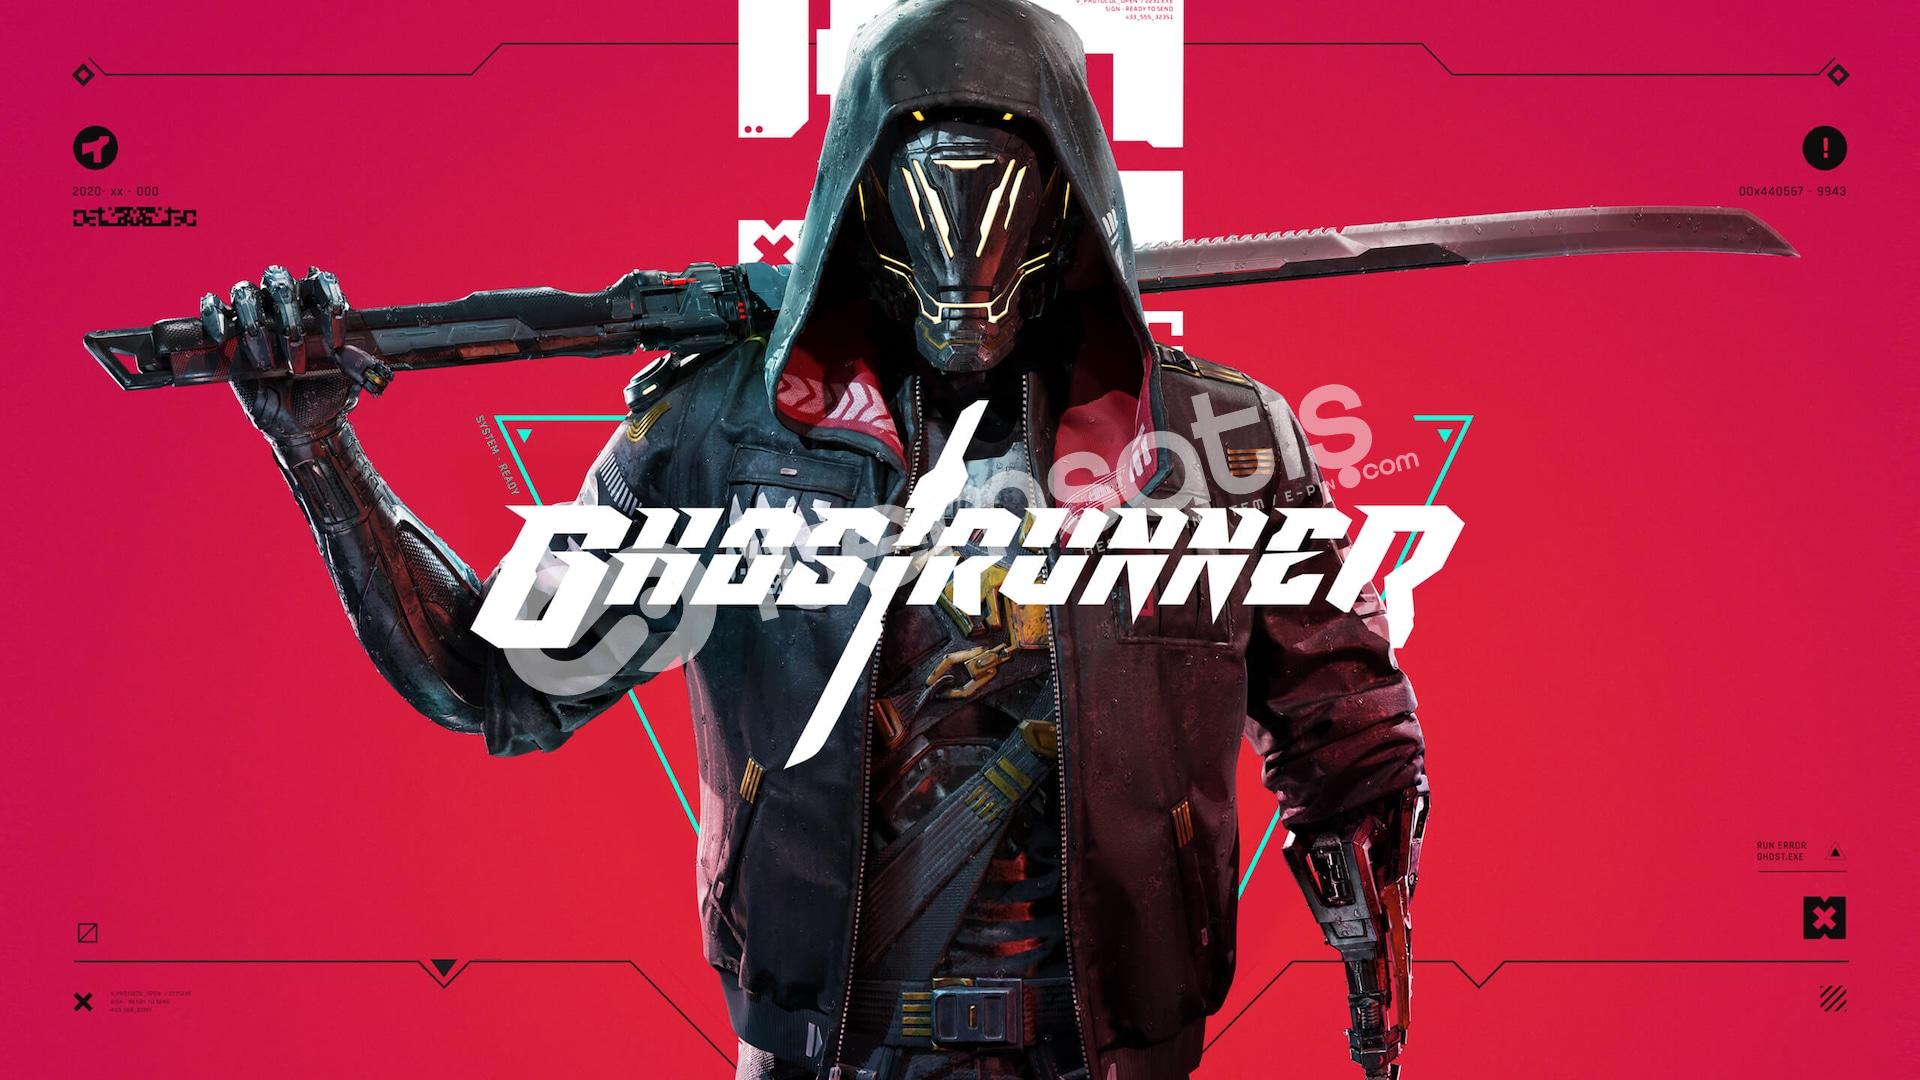 Ghostrunner (3.00TL)